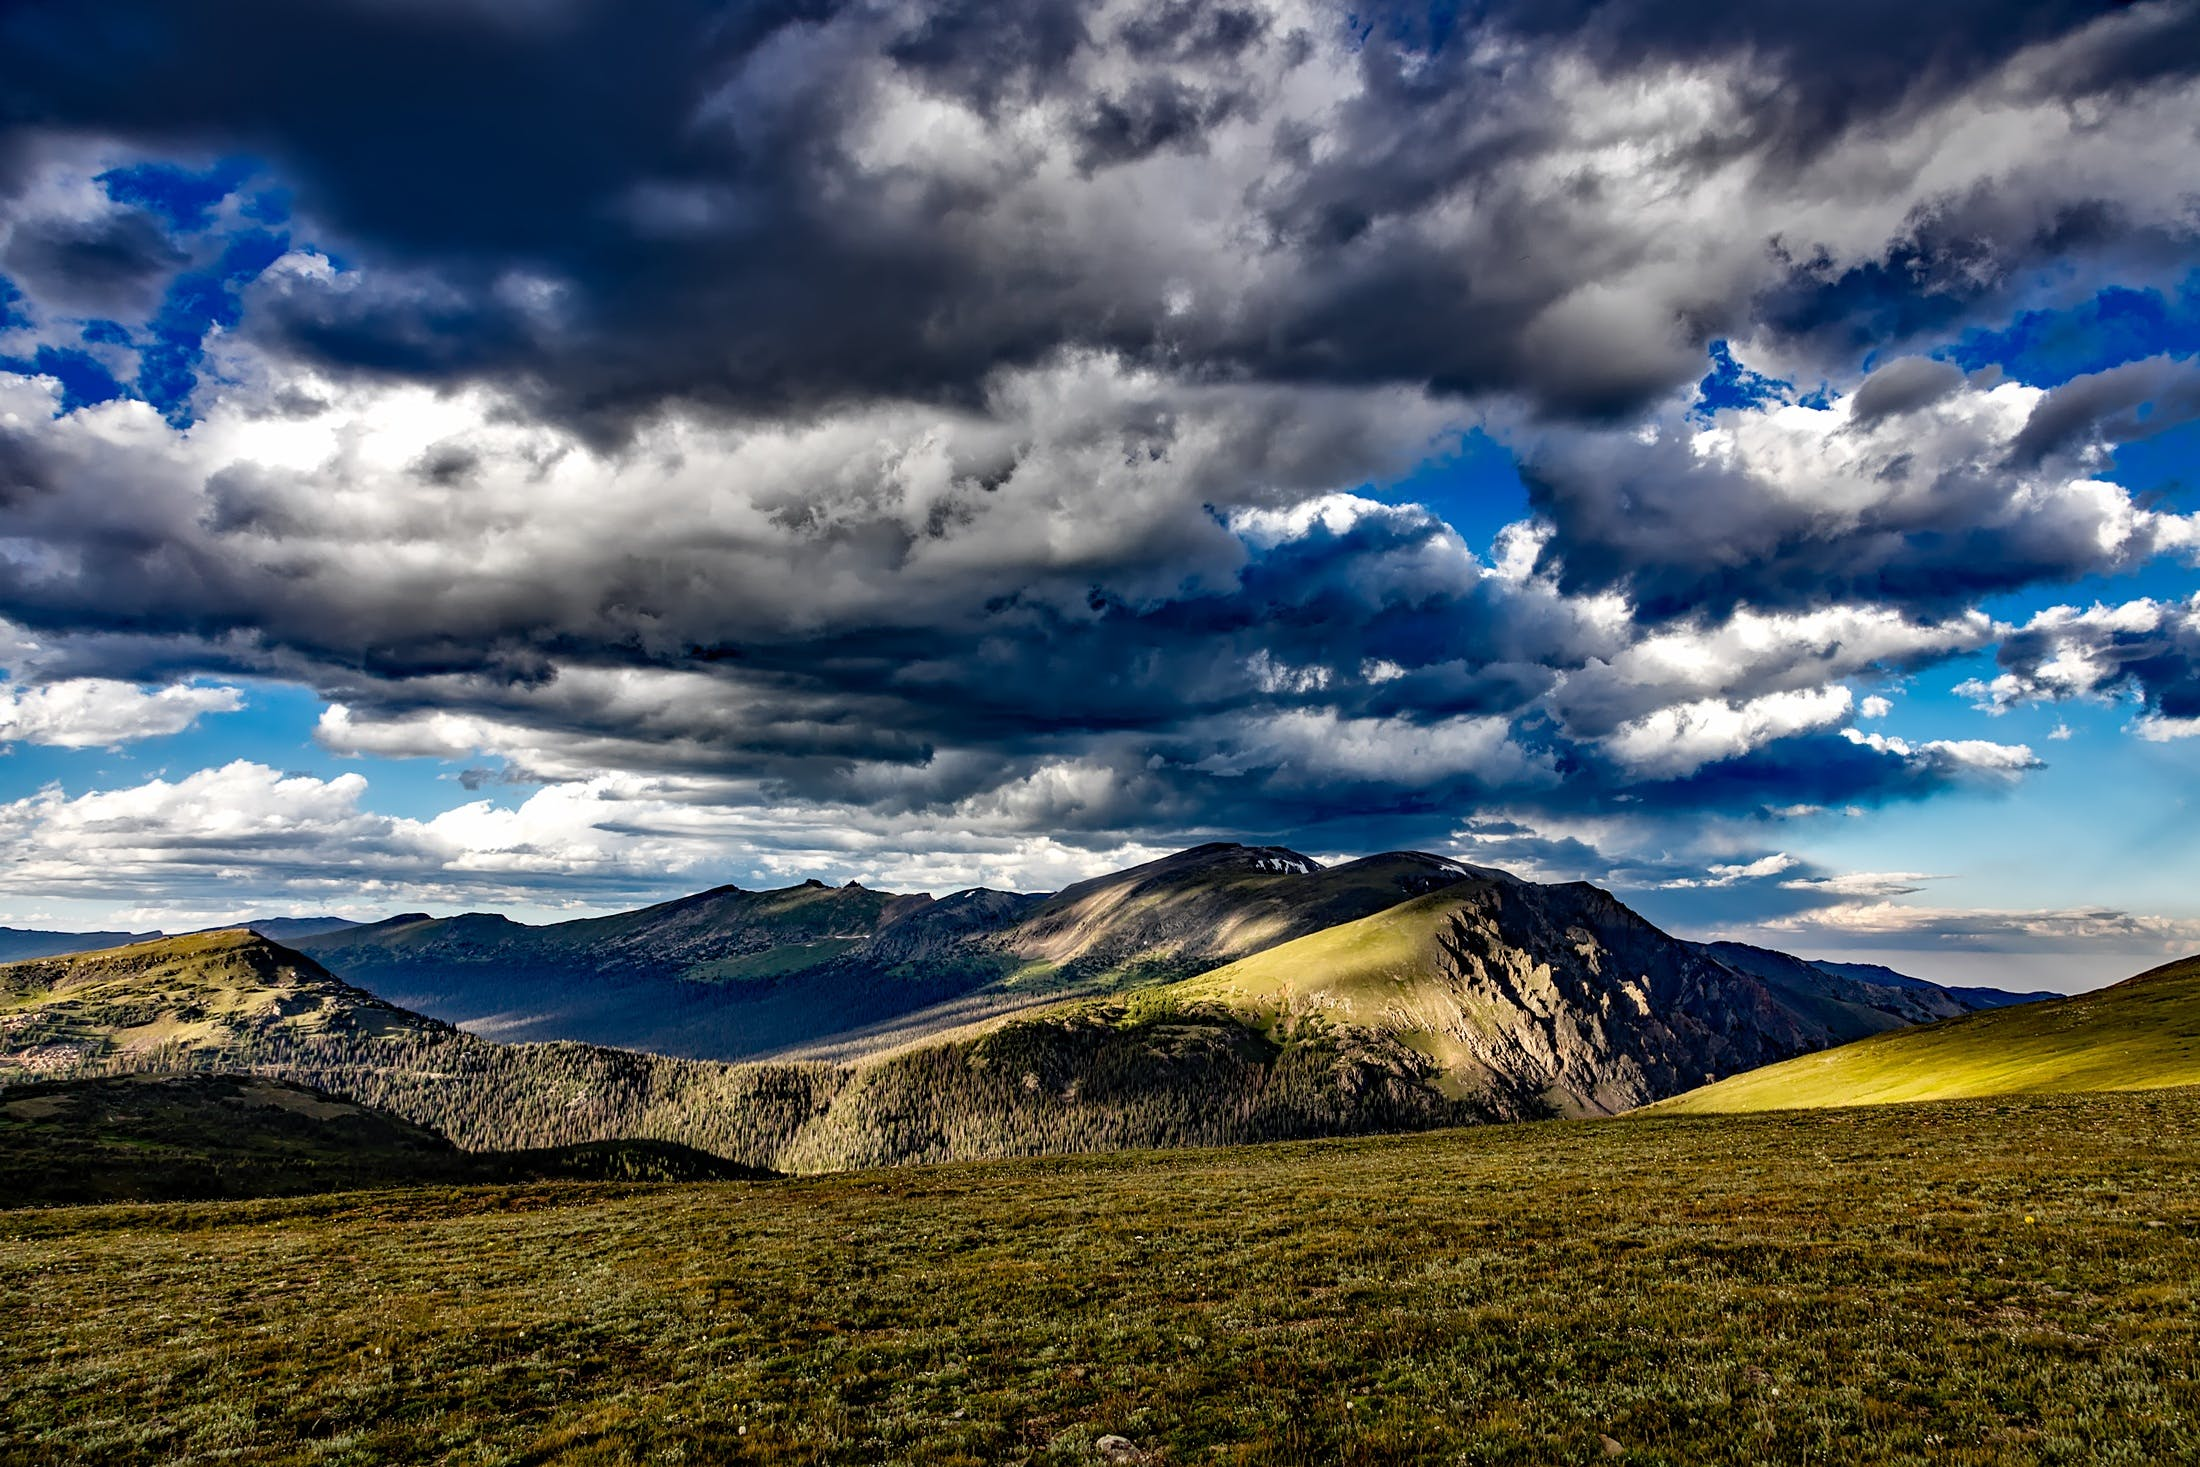 Kostenloses Stock Foto zu berg, gras, himmel, landschaft